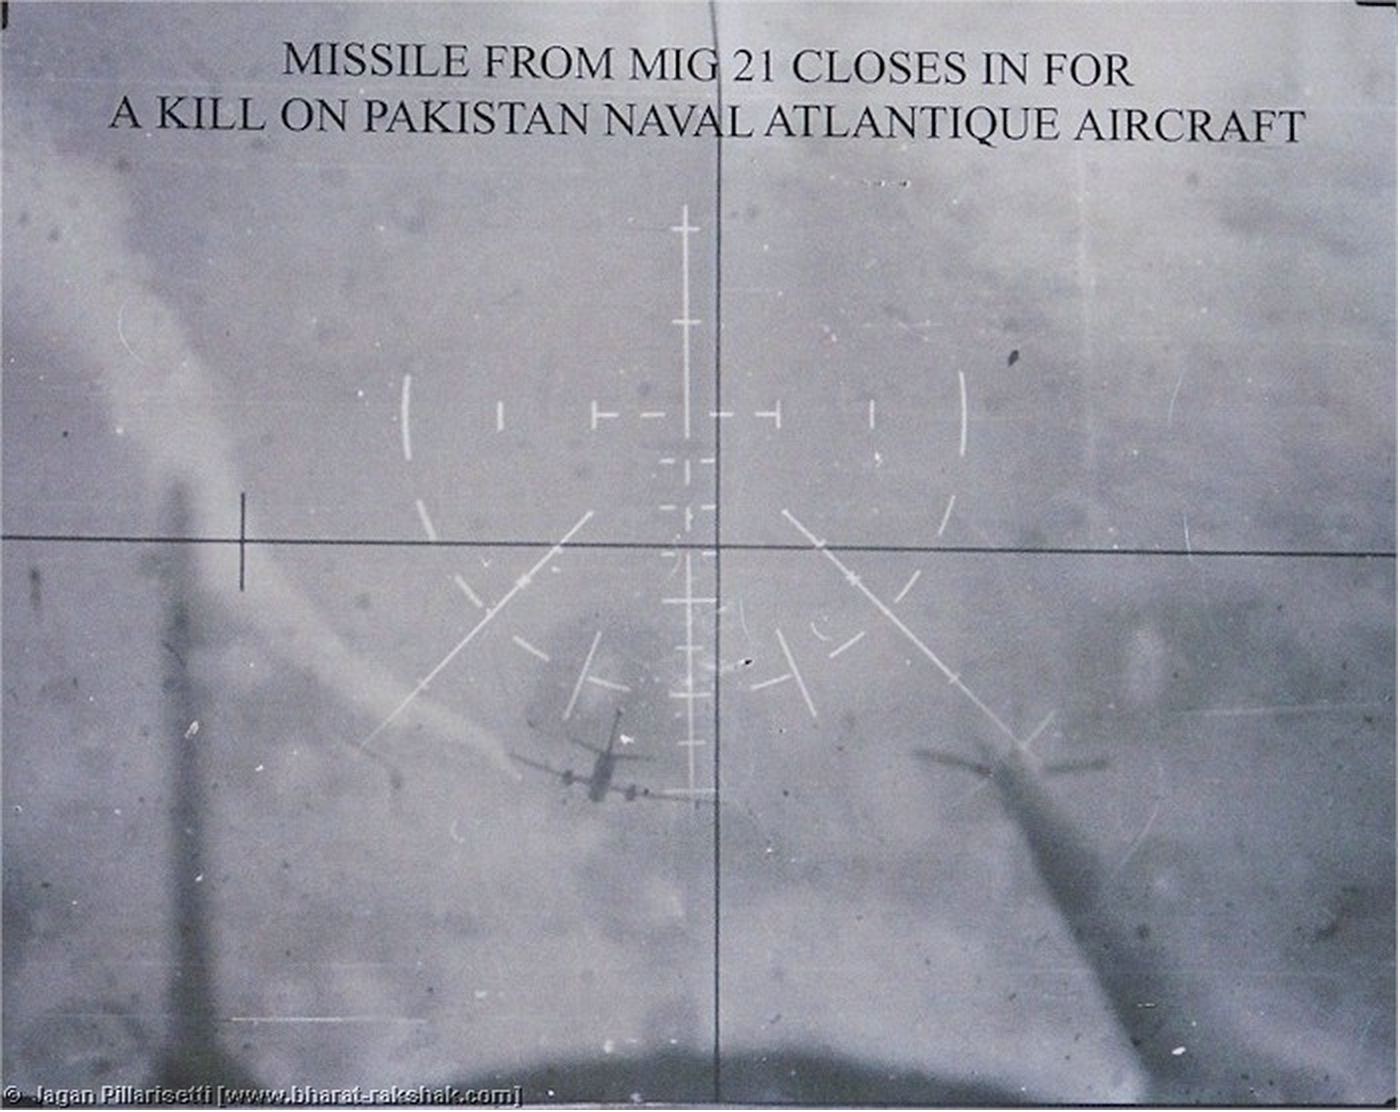 Cuadro de texto 2: Evidencia en las imágenes militares    Text Box 2: Evidence in military images